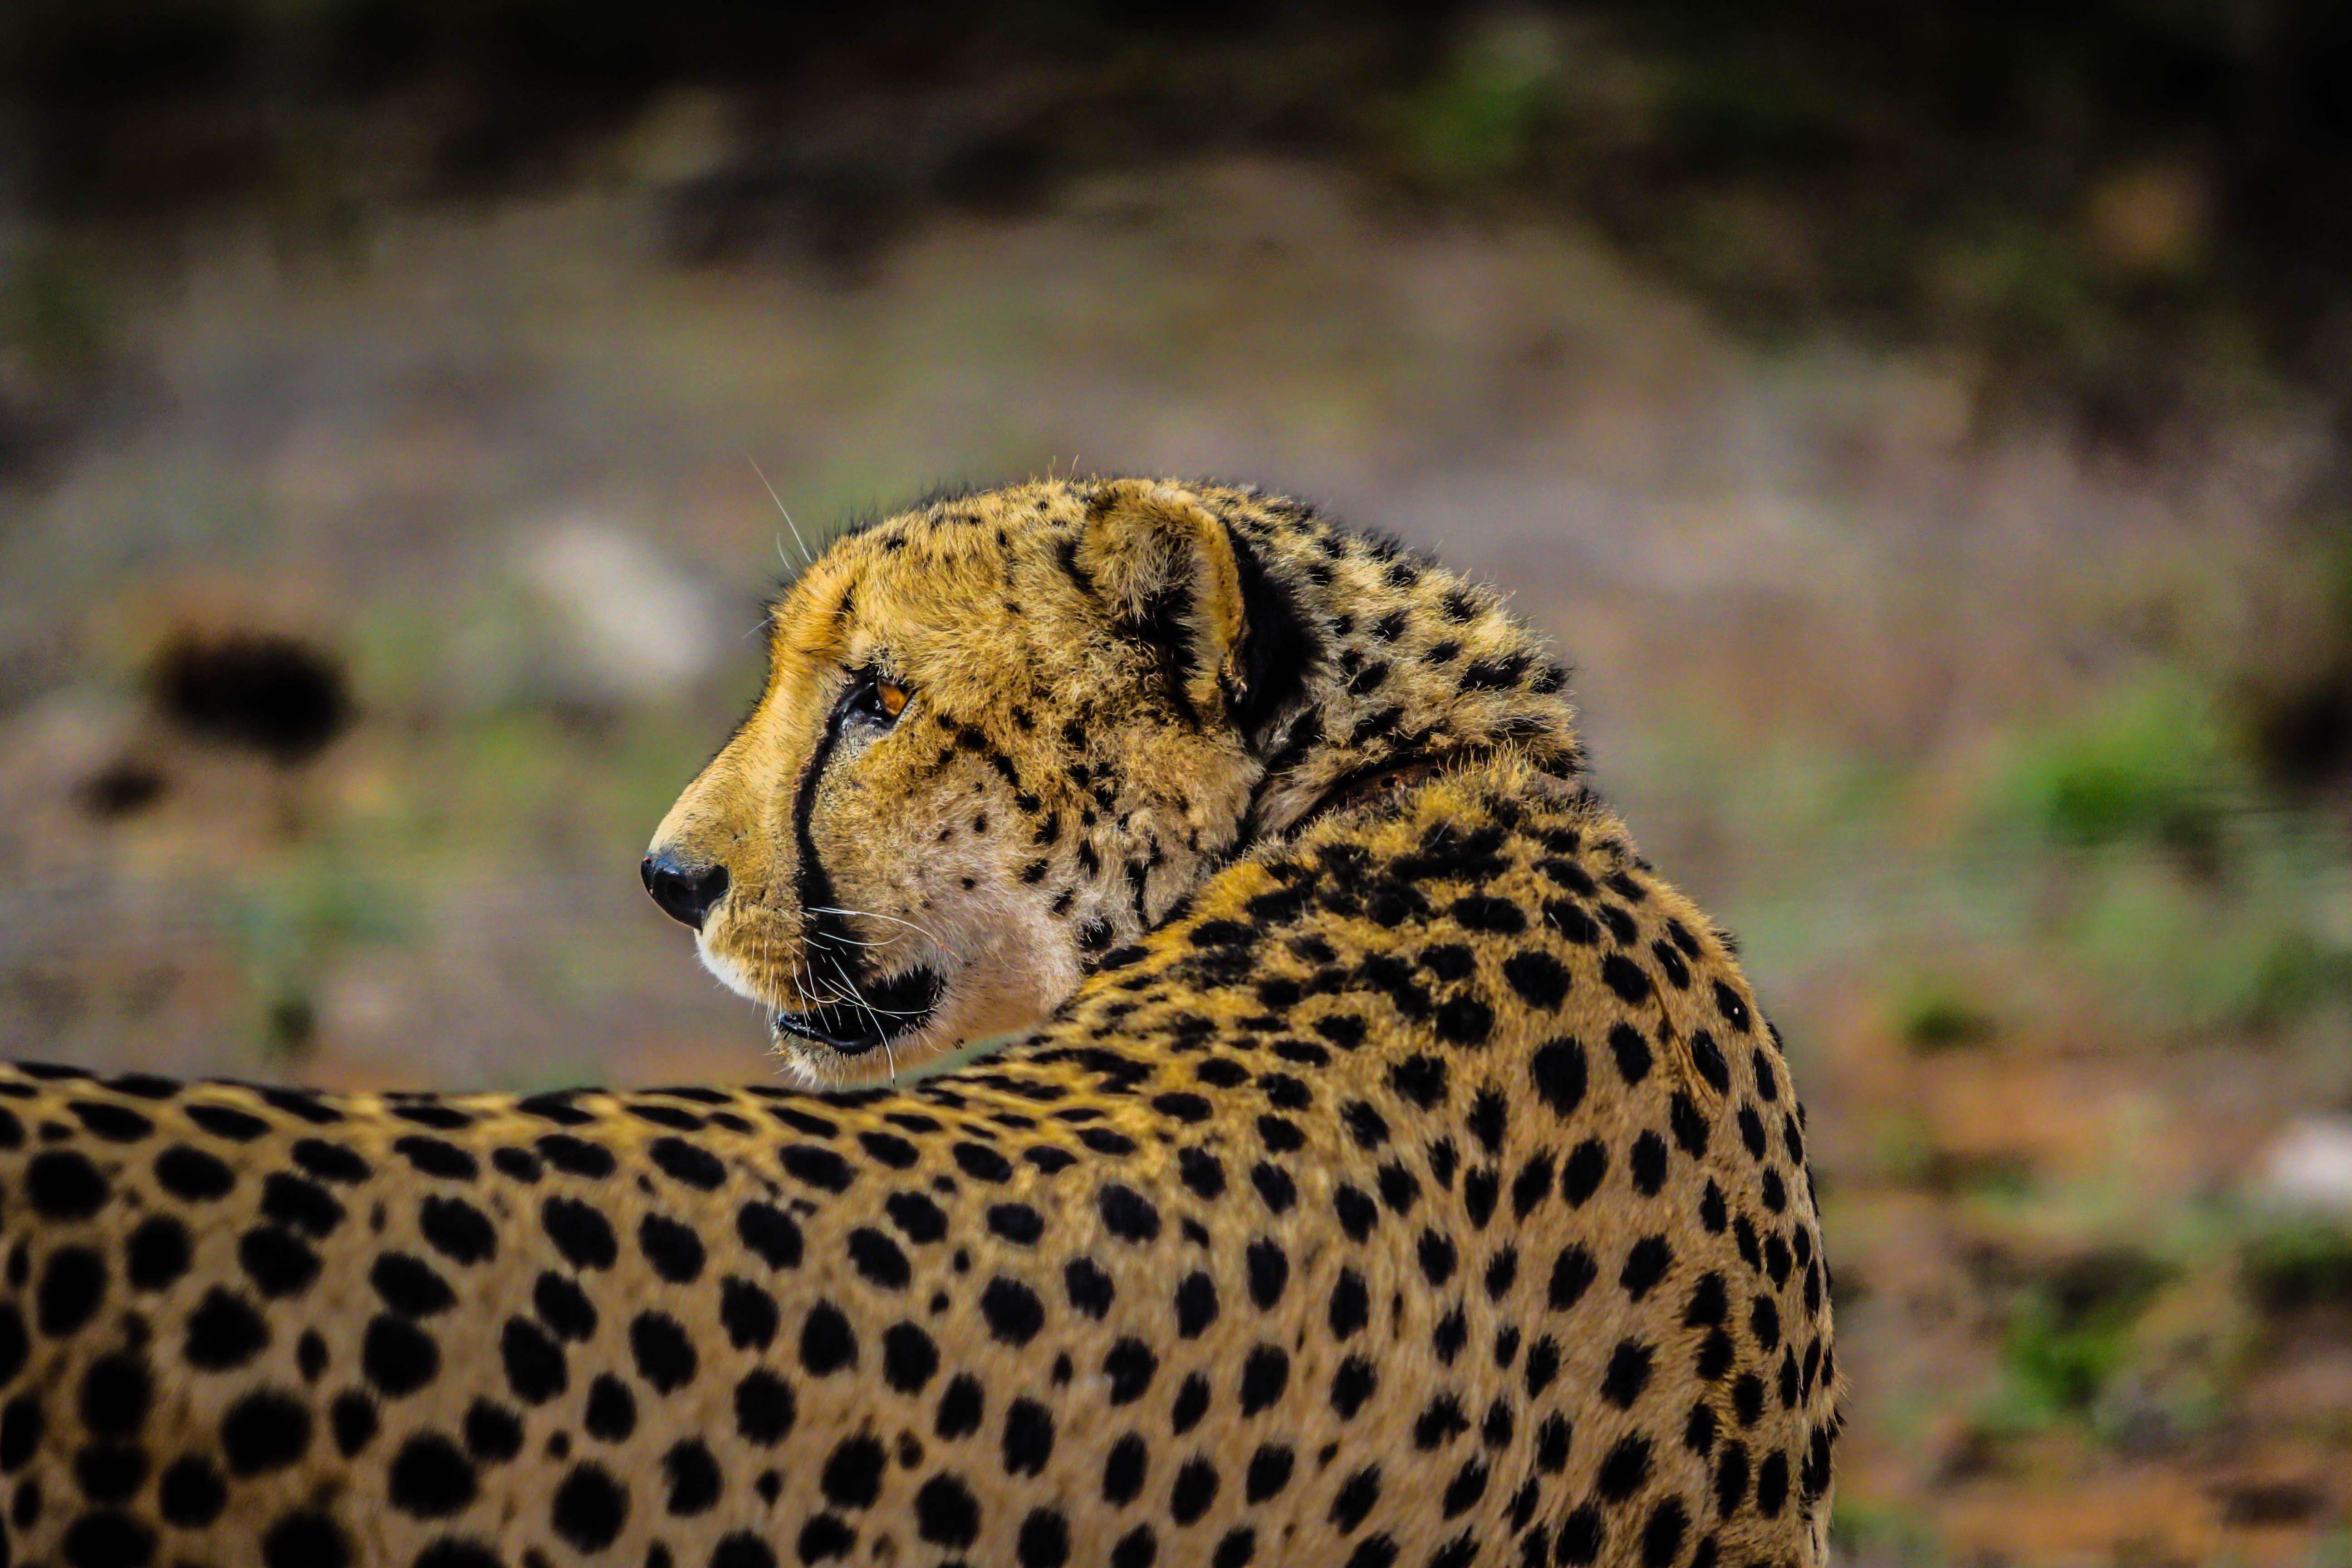 Gratis stockfoto met Afrika, cheetah, kat, katachtig